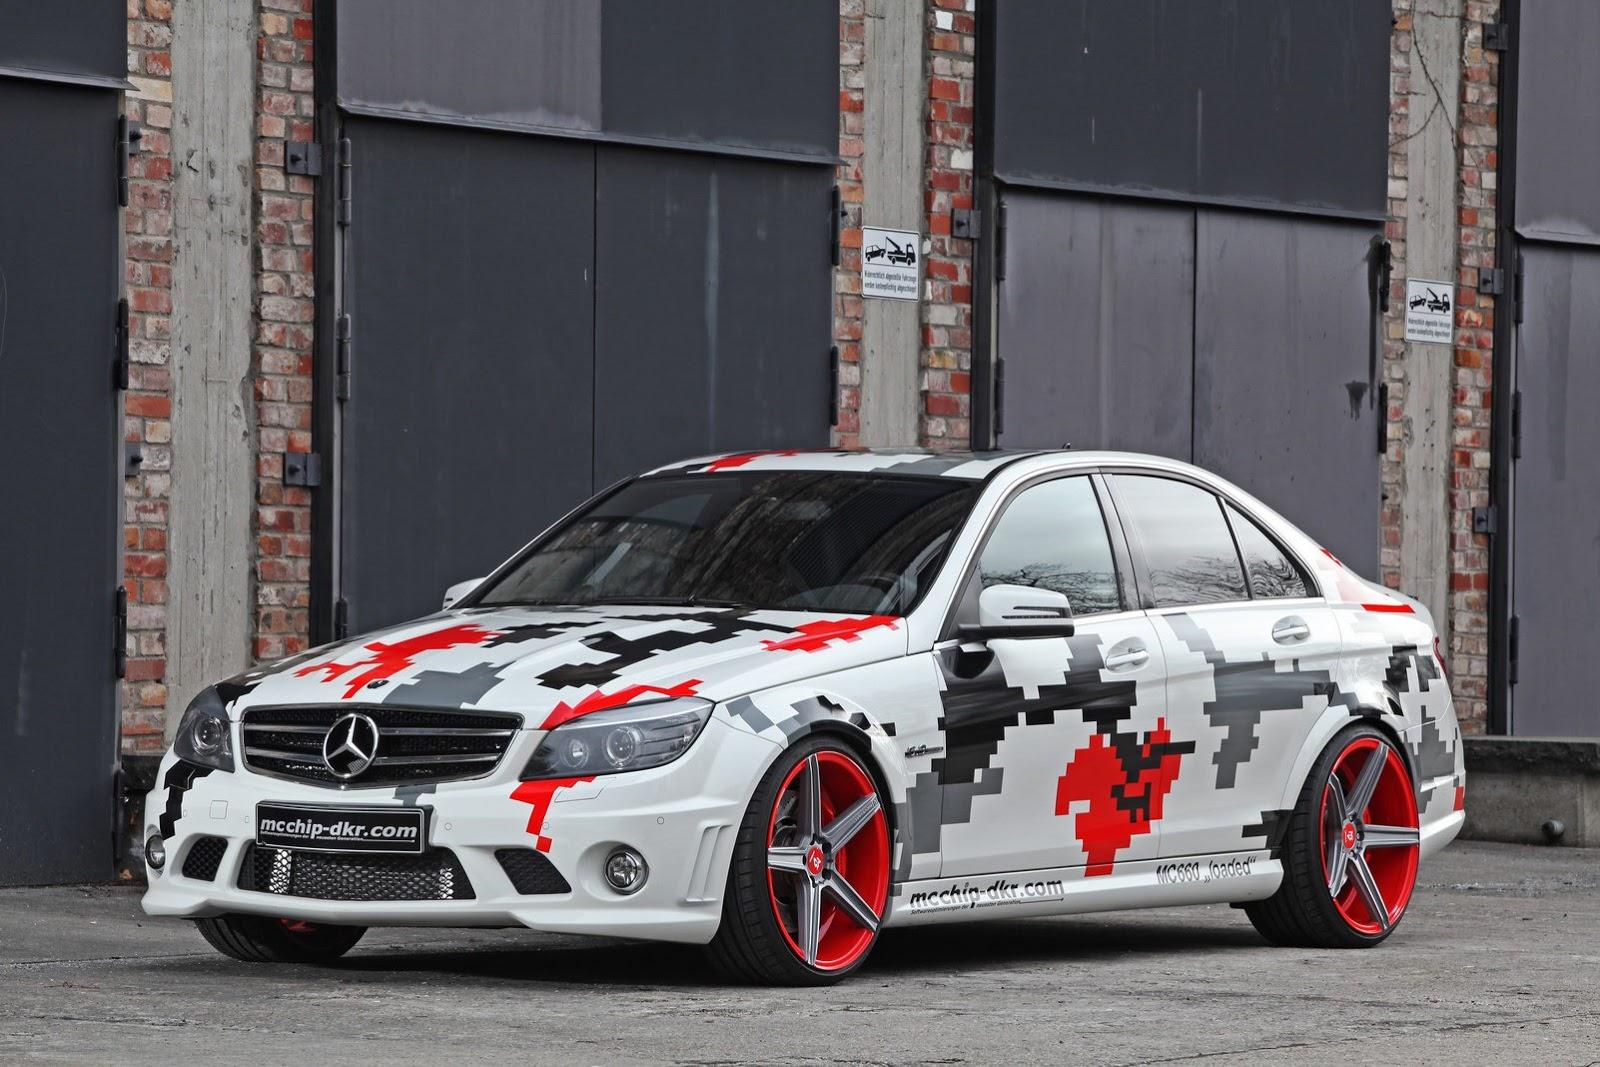 Mercedes benz w204 c63 amg performance modifications mbworld for Mercedes benz modification